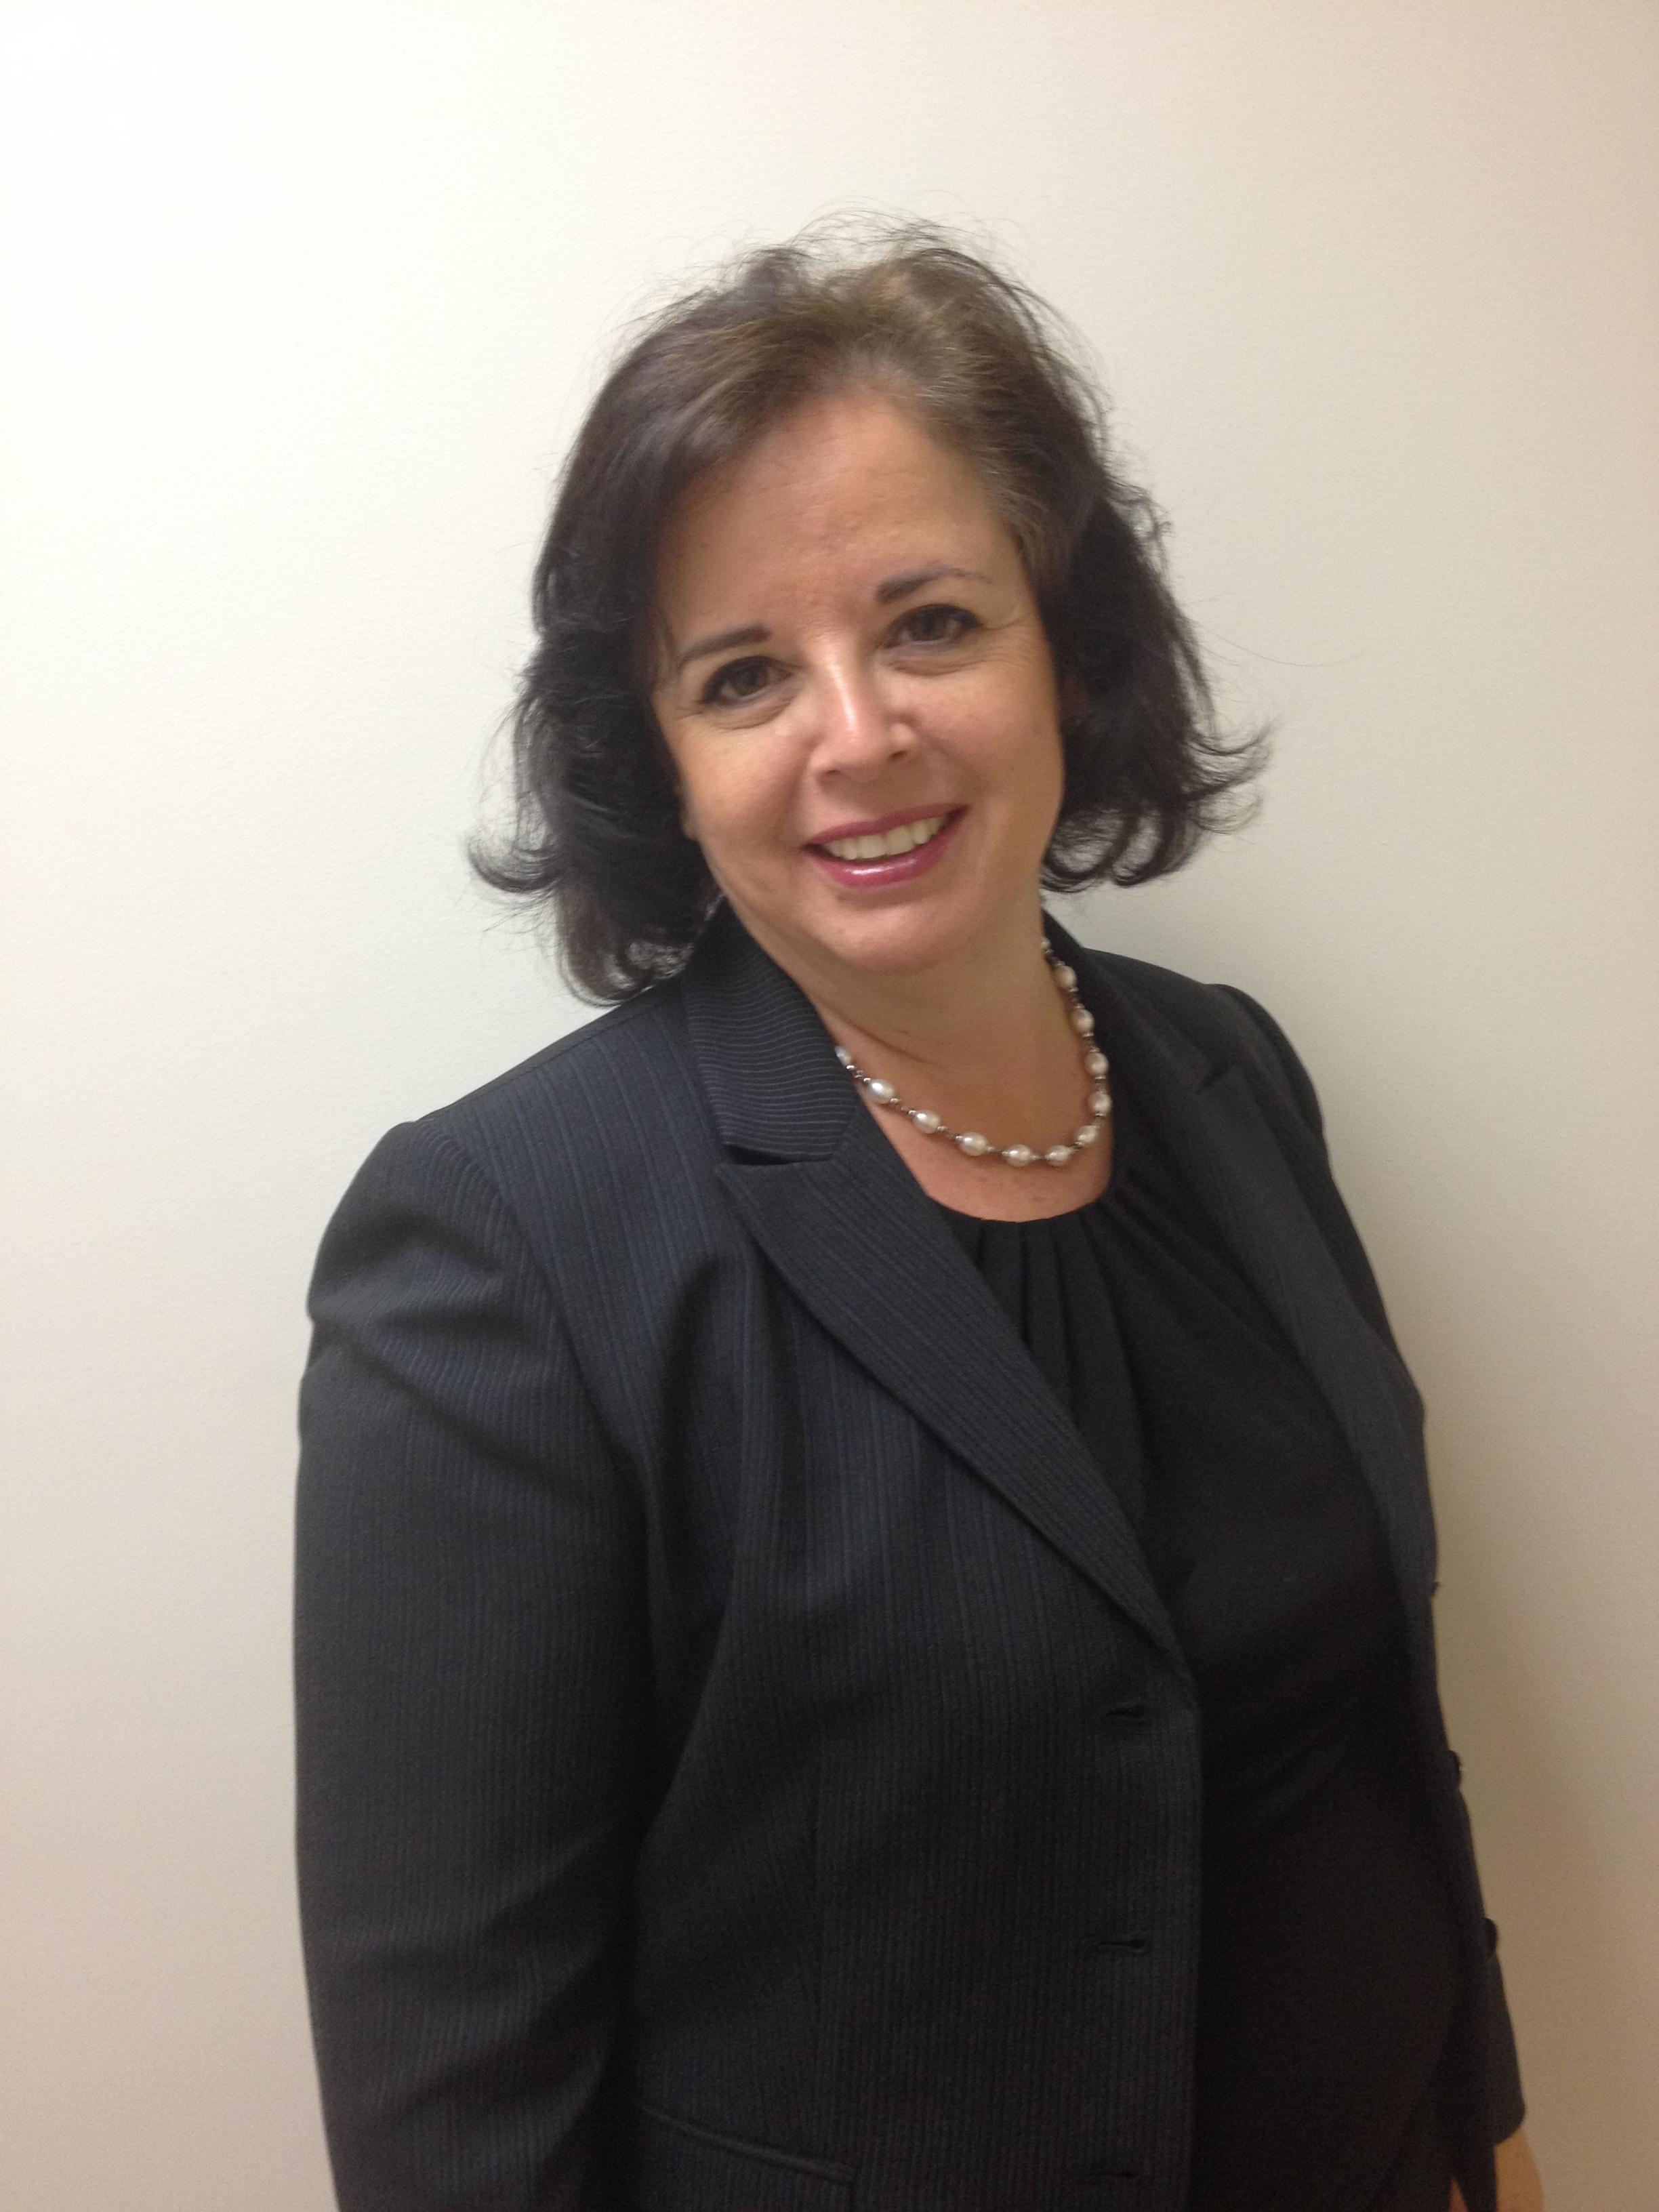 Carmen Monroy